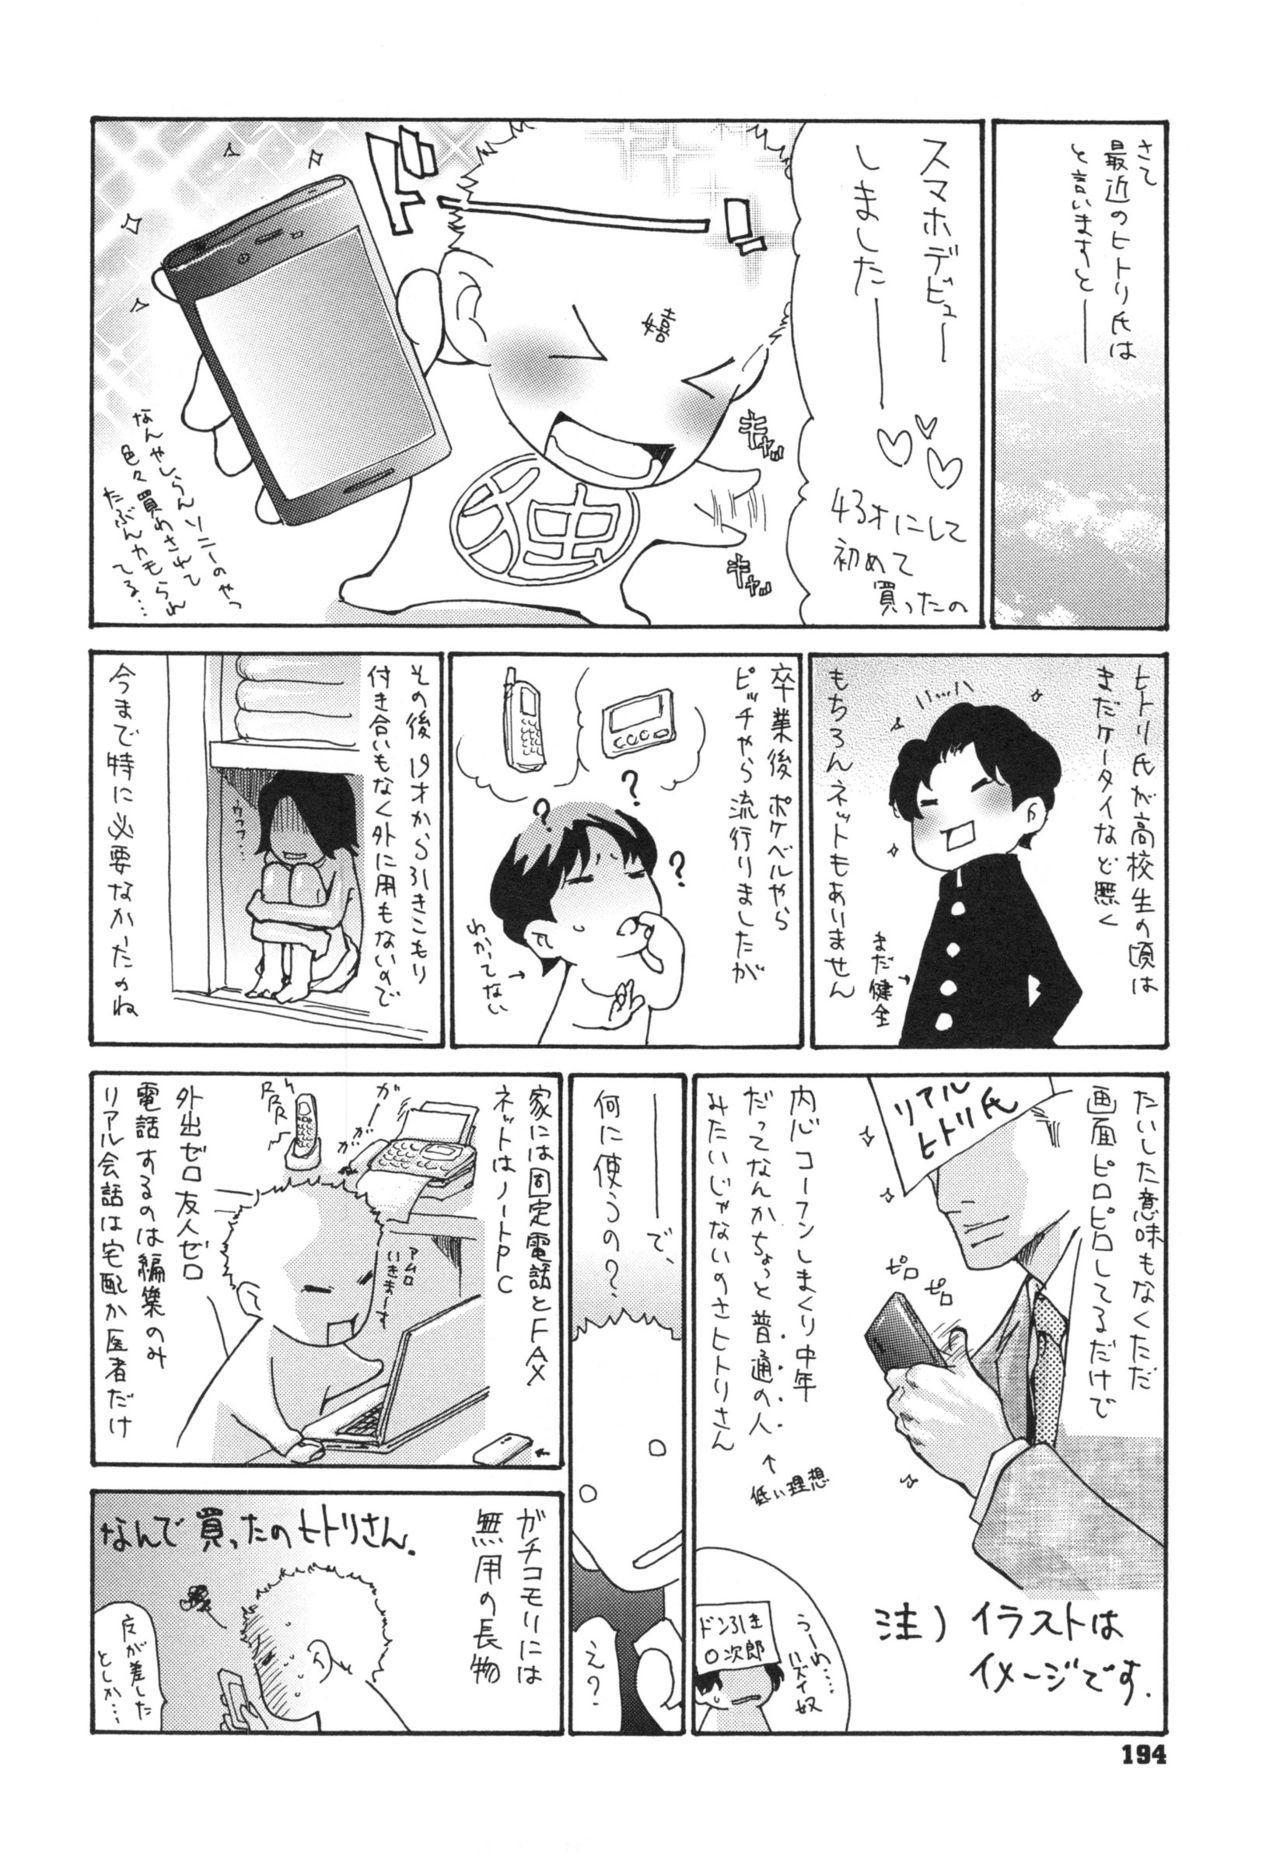 Niku-zuma Netorare Maniacs 194